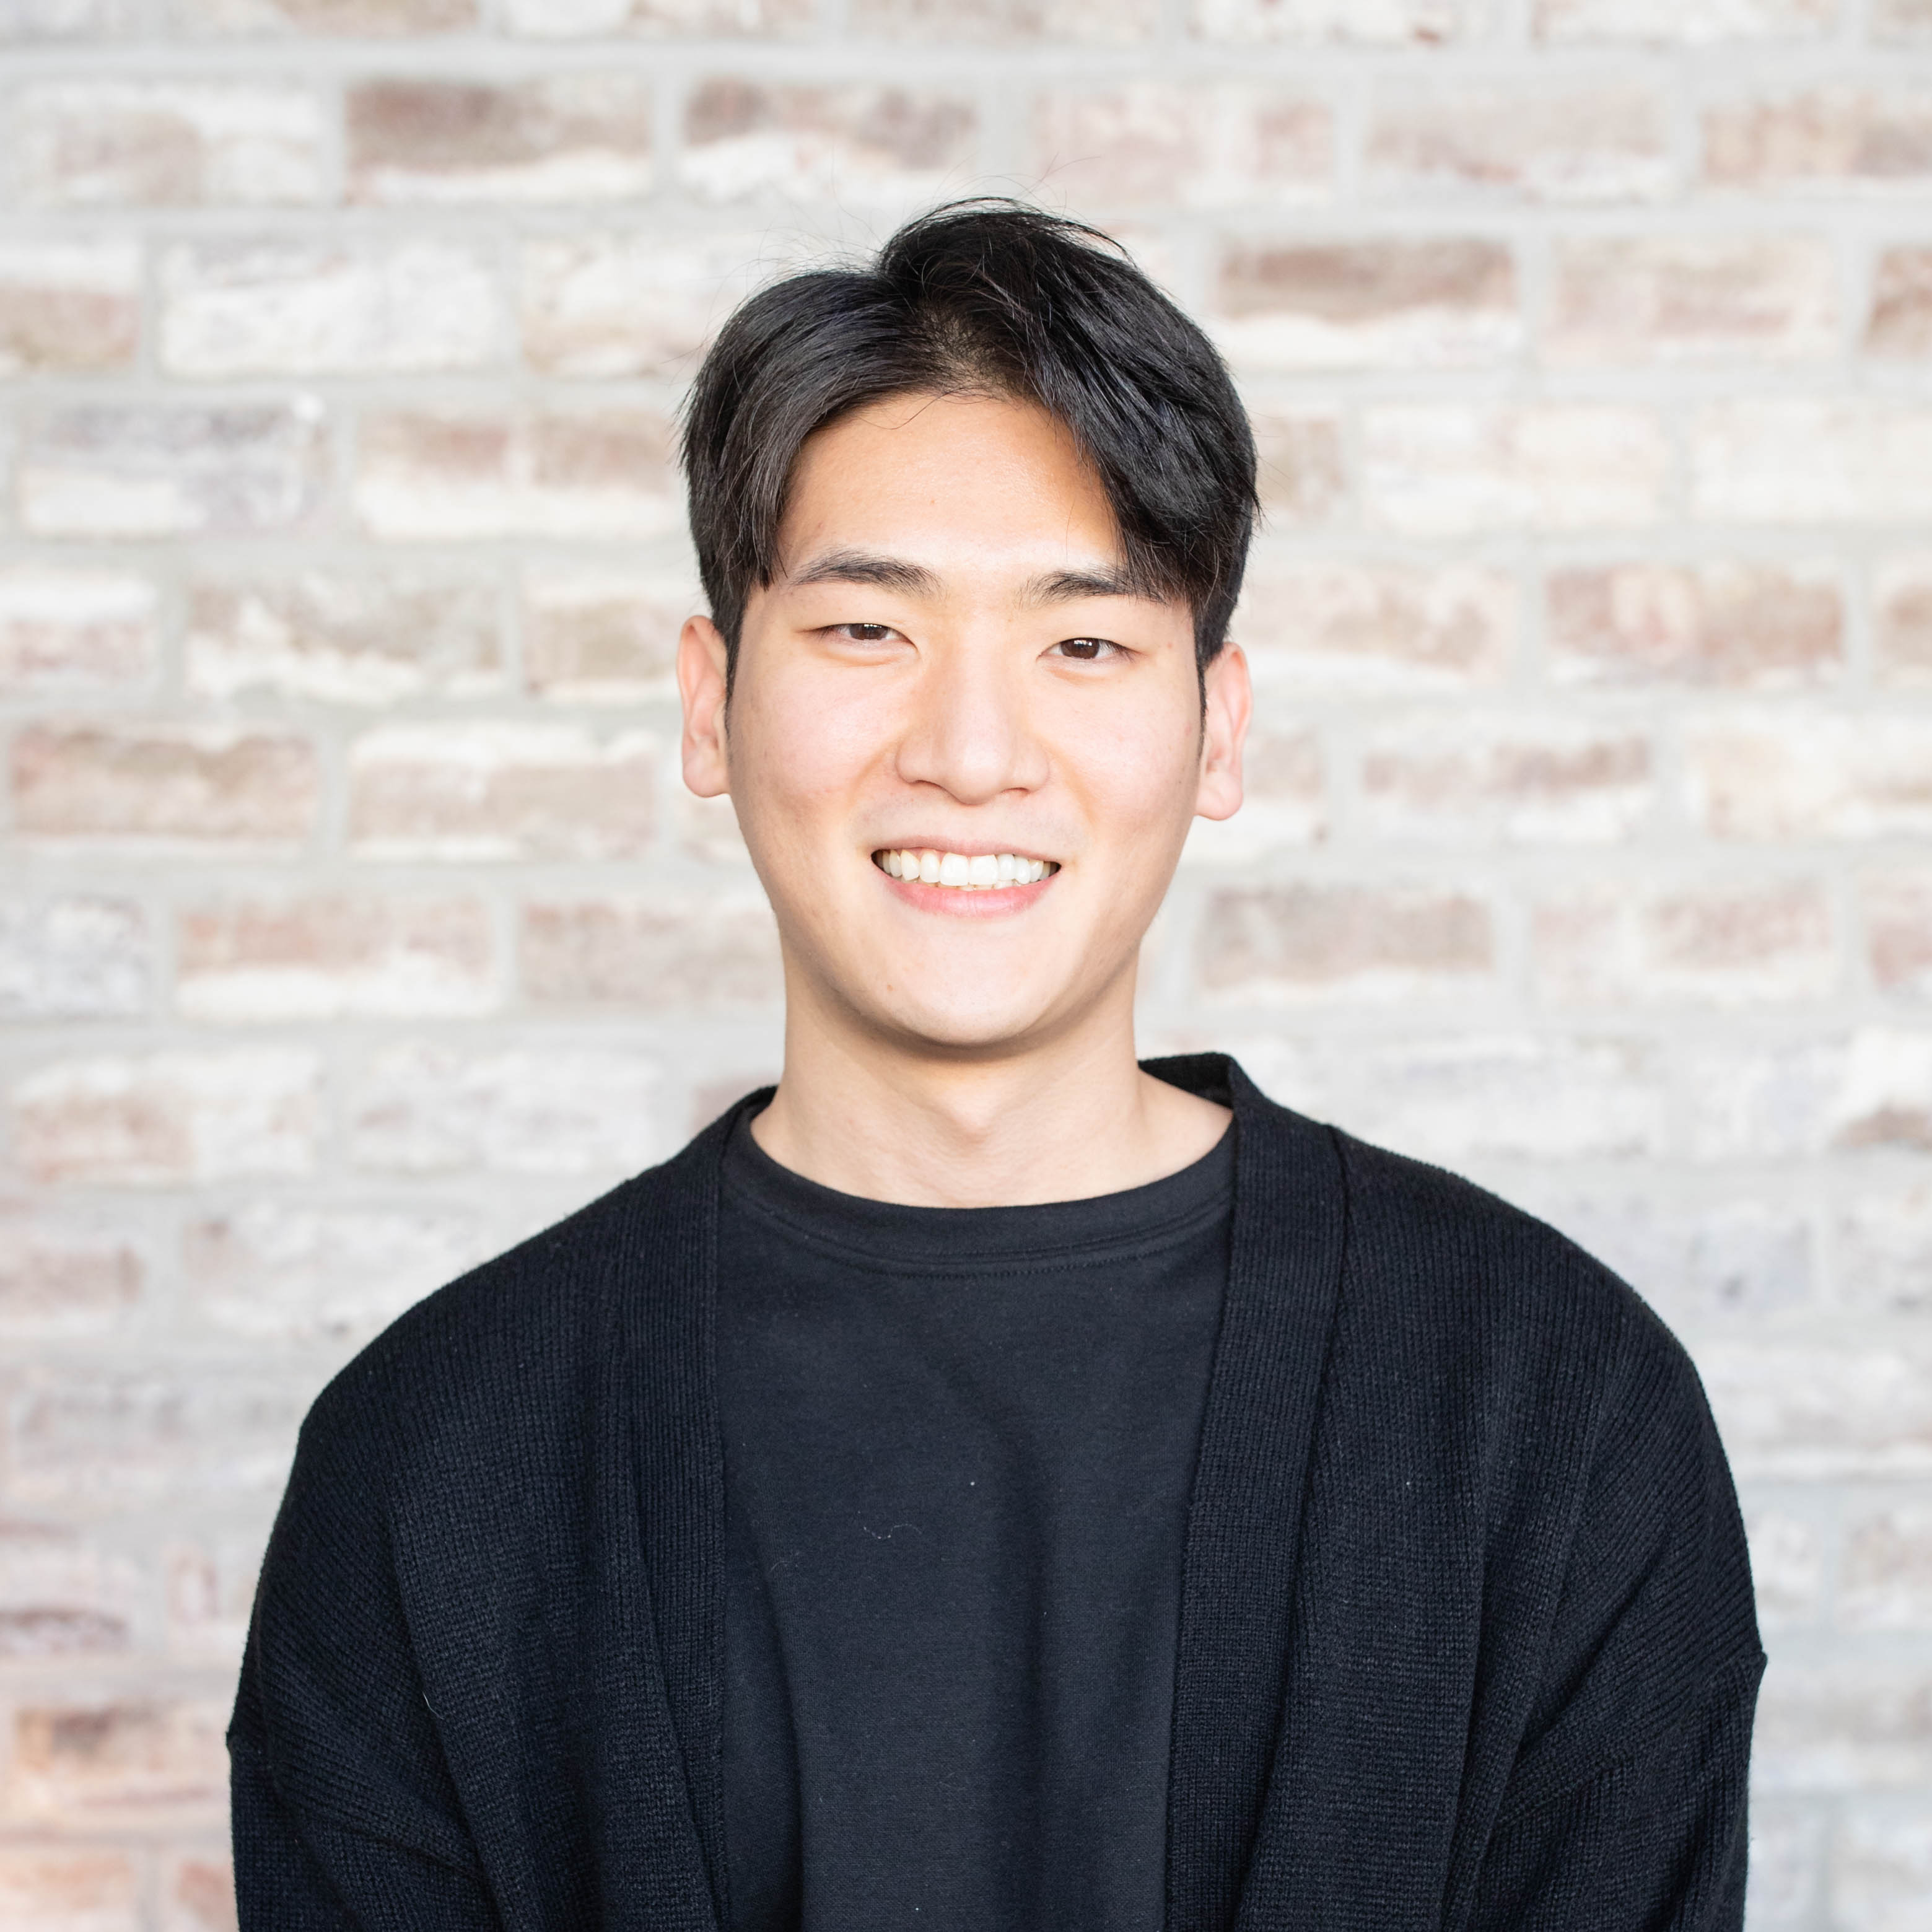 Hyun Lee